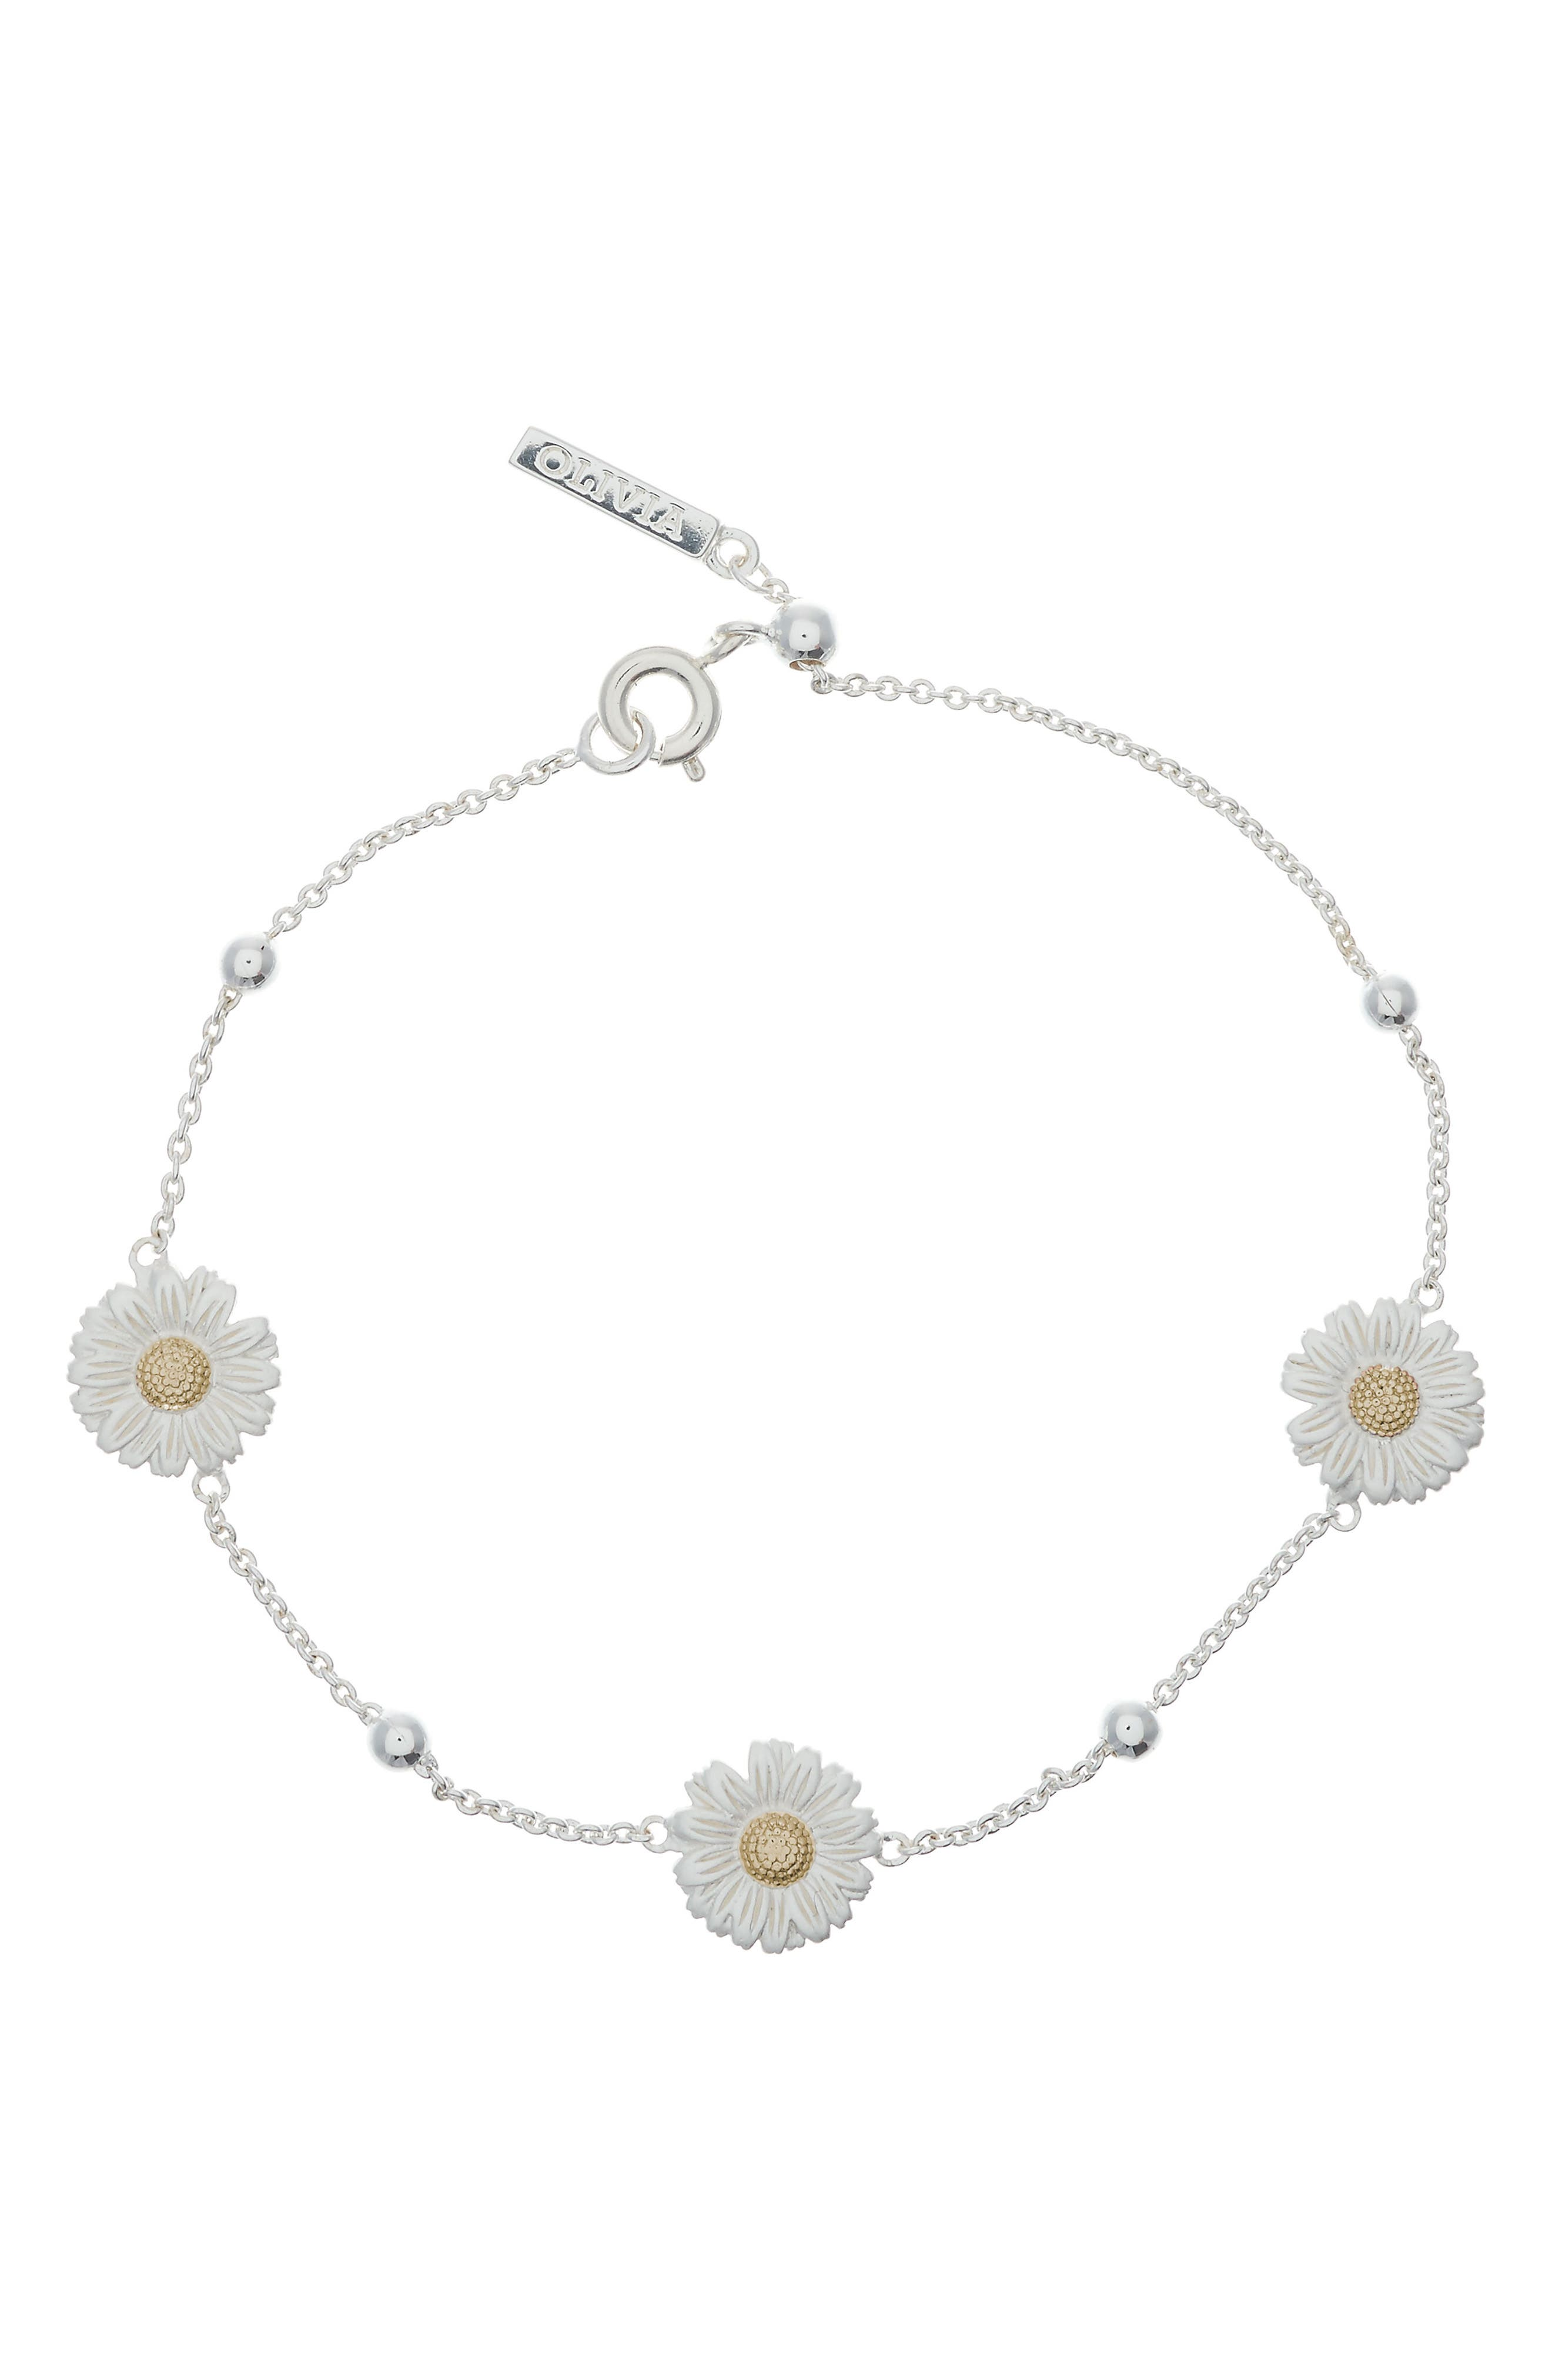 Main Image - Olivia Burton 3D Daisy Ball Chain Bracelet